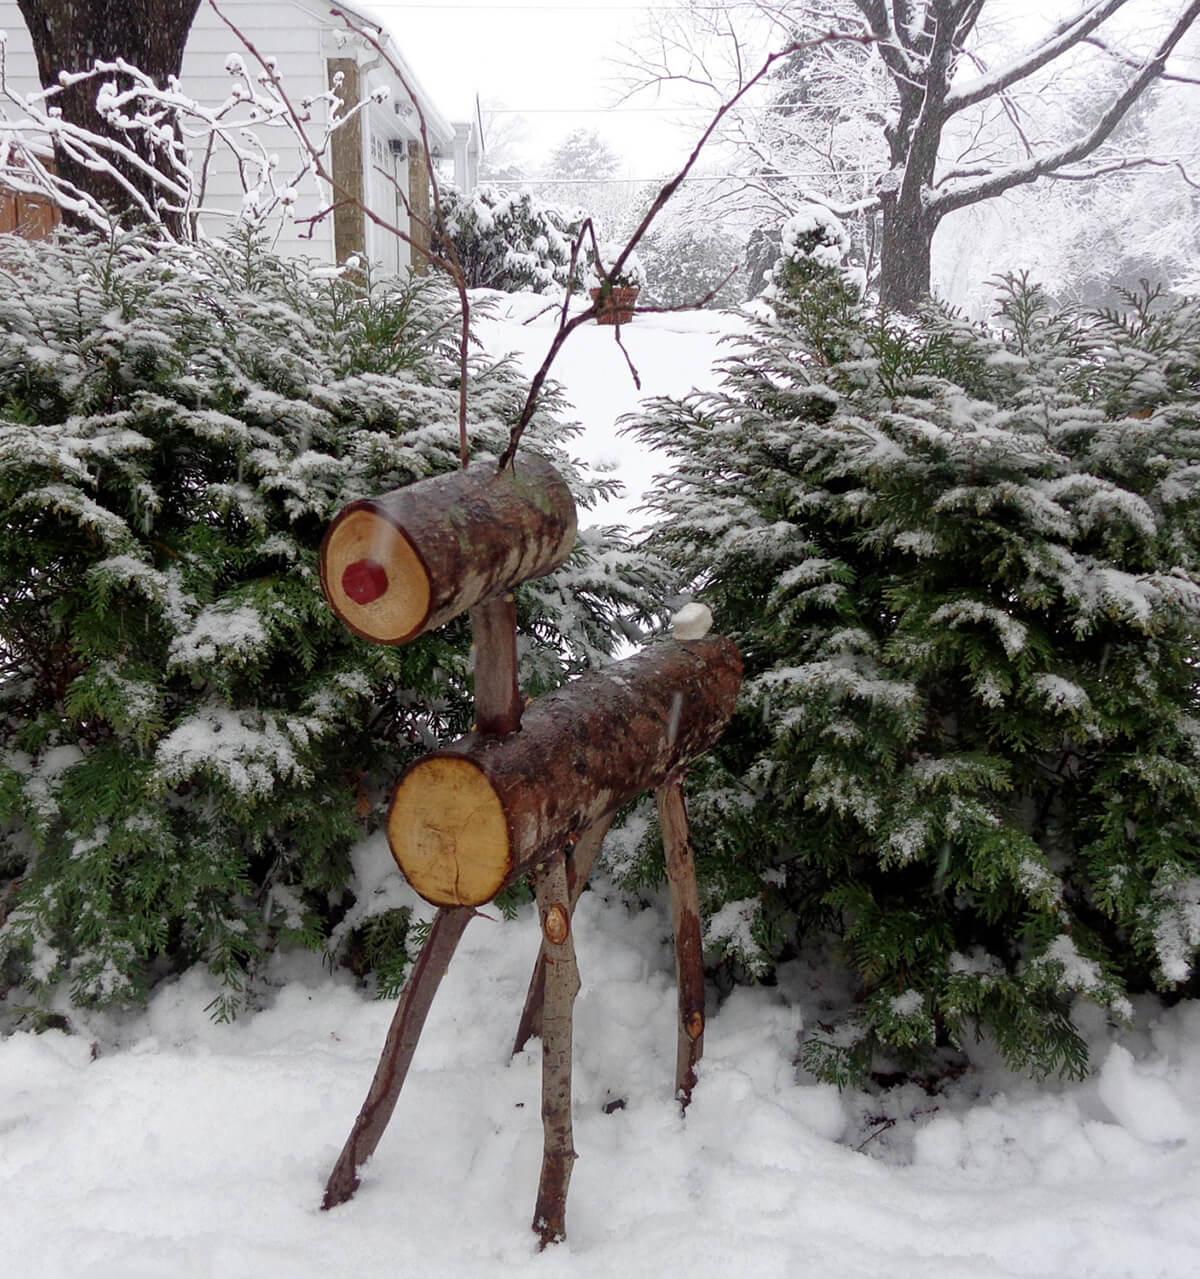 Marvelous Wooden Firewood Reindeer Christmas Decor